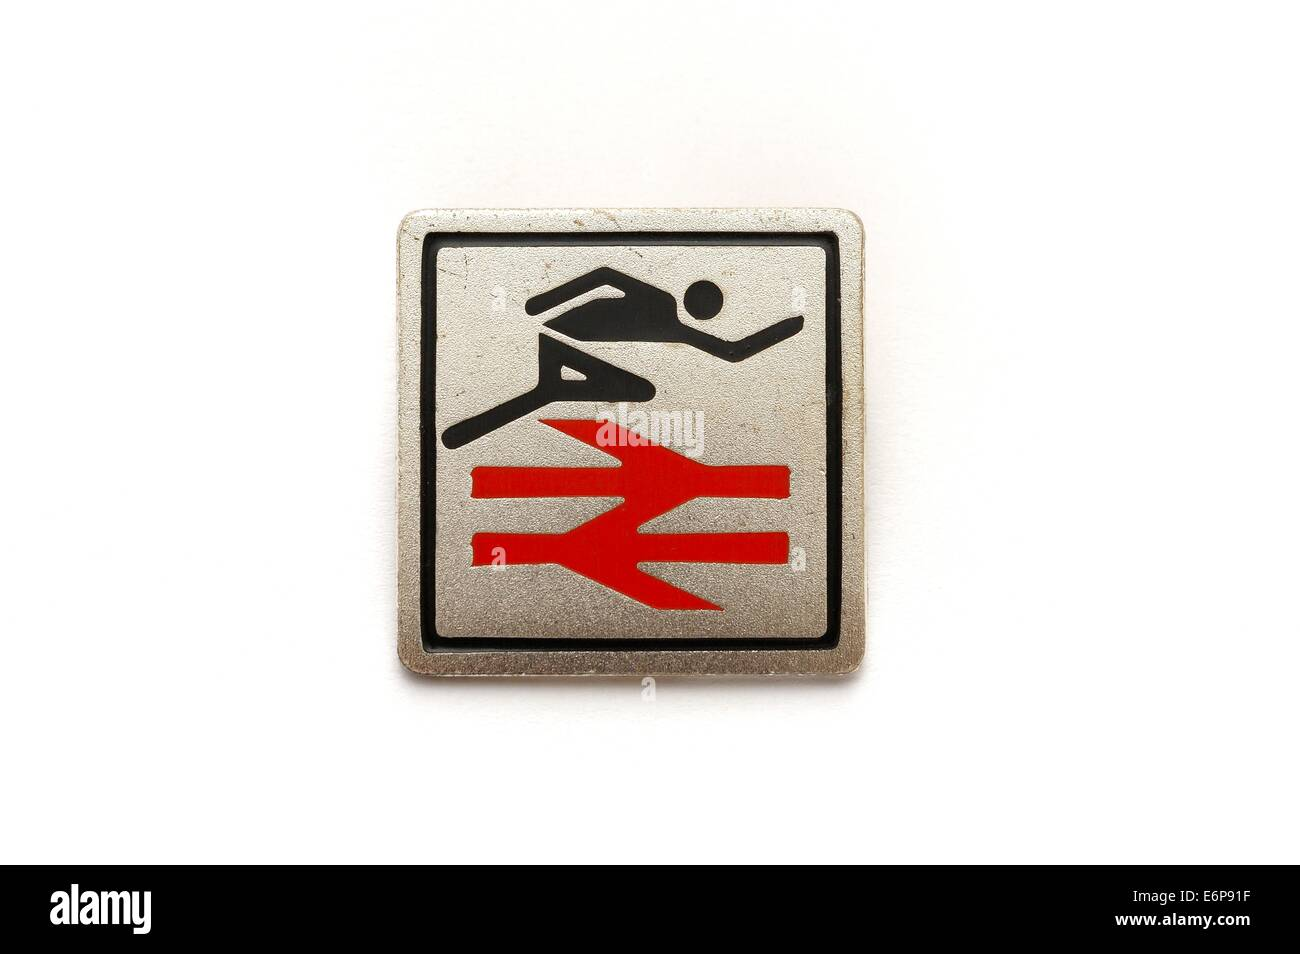 British railways sprinter badge logo stock photo 73019451 alamy british railways sprinter badge logo biocorpaavc Images